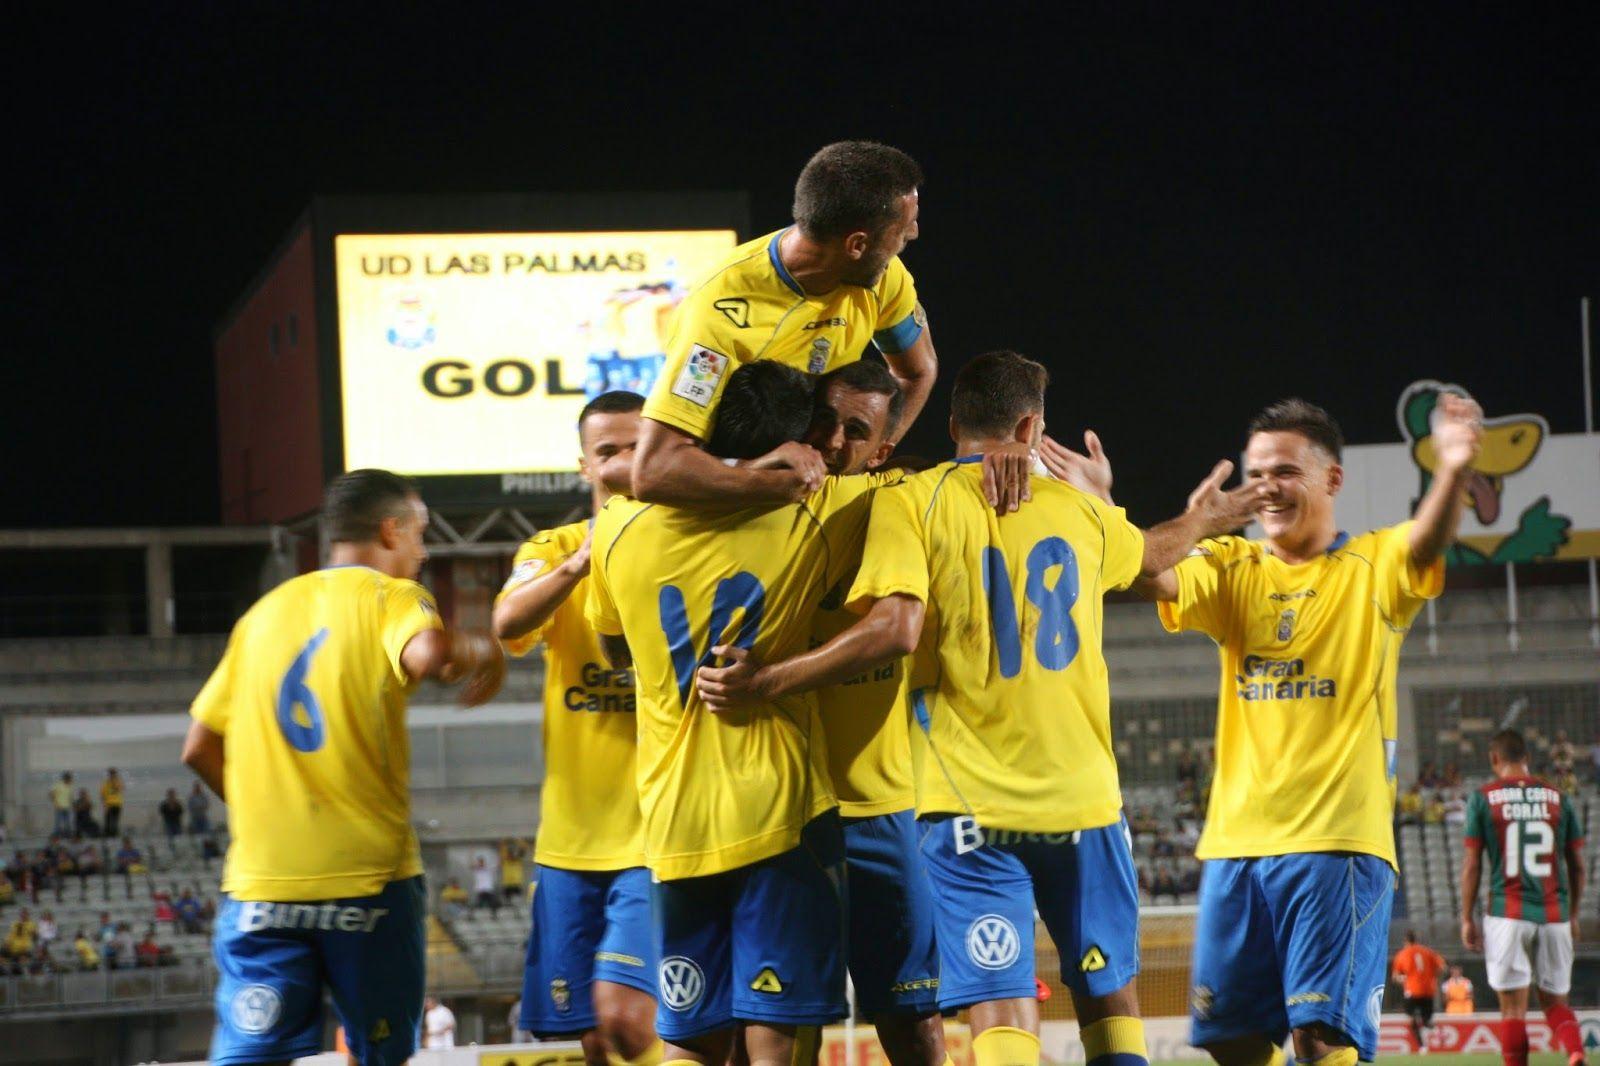 UDLasPalmas Celebracin De La UD 9ine Unin Deportiva Las